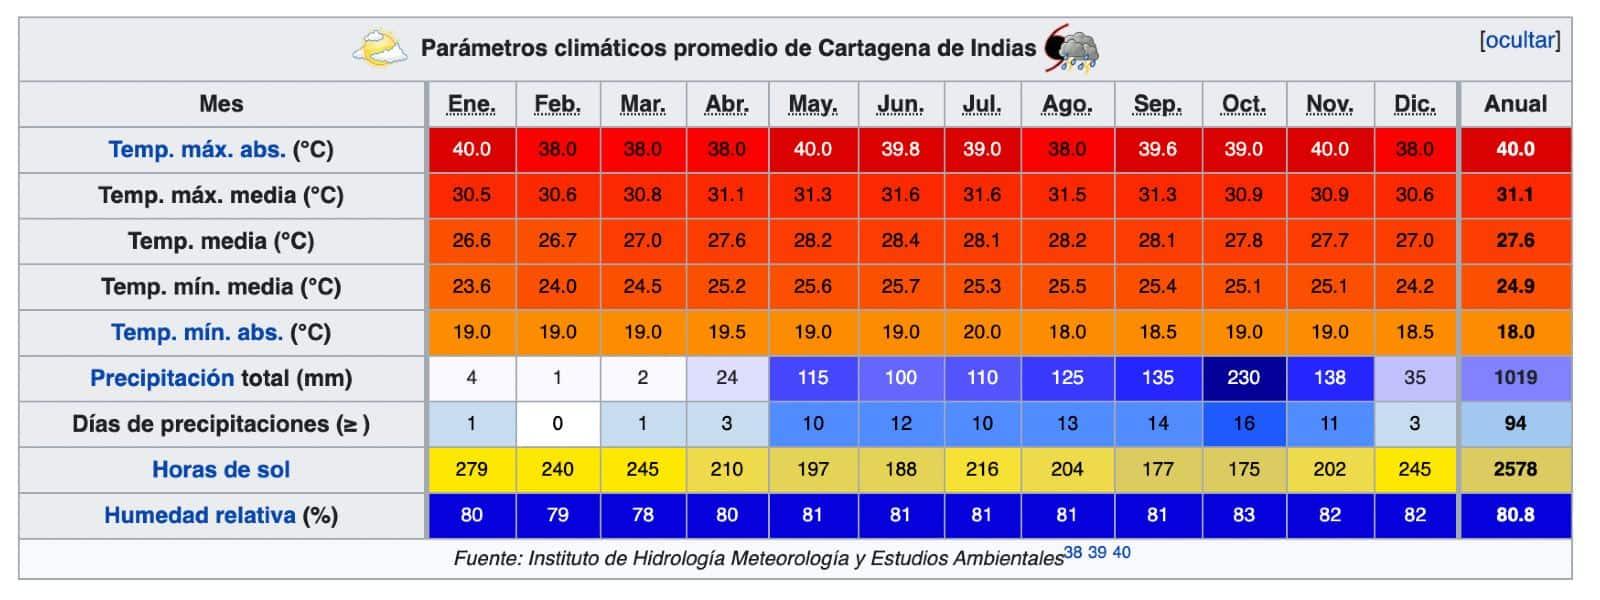 previsioni meteo Cartagena de Indias